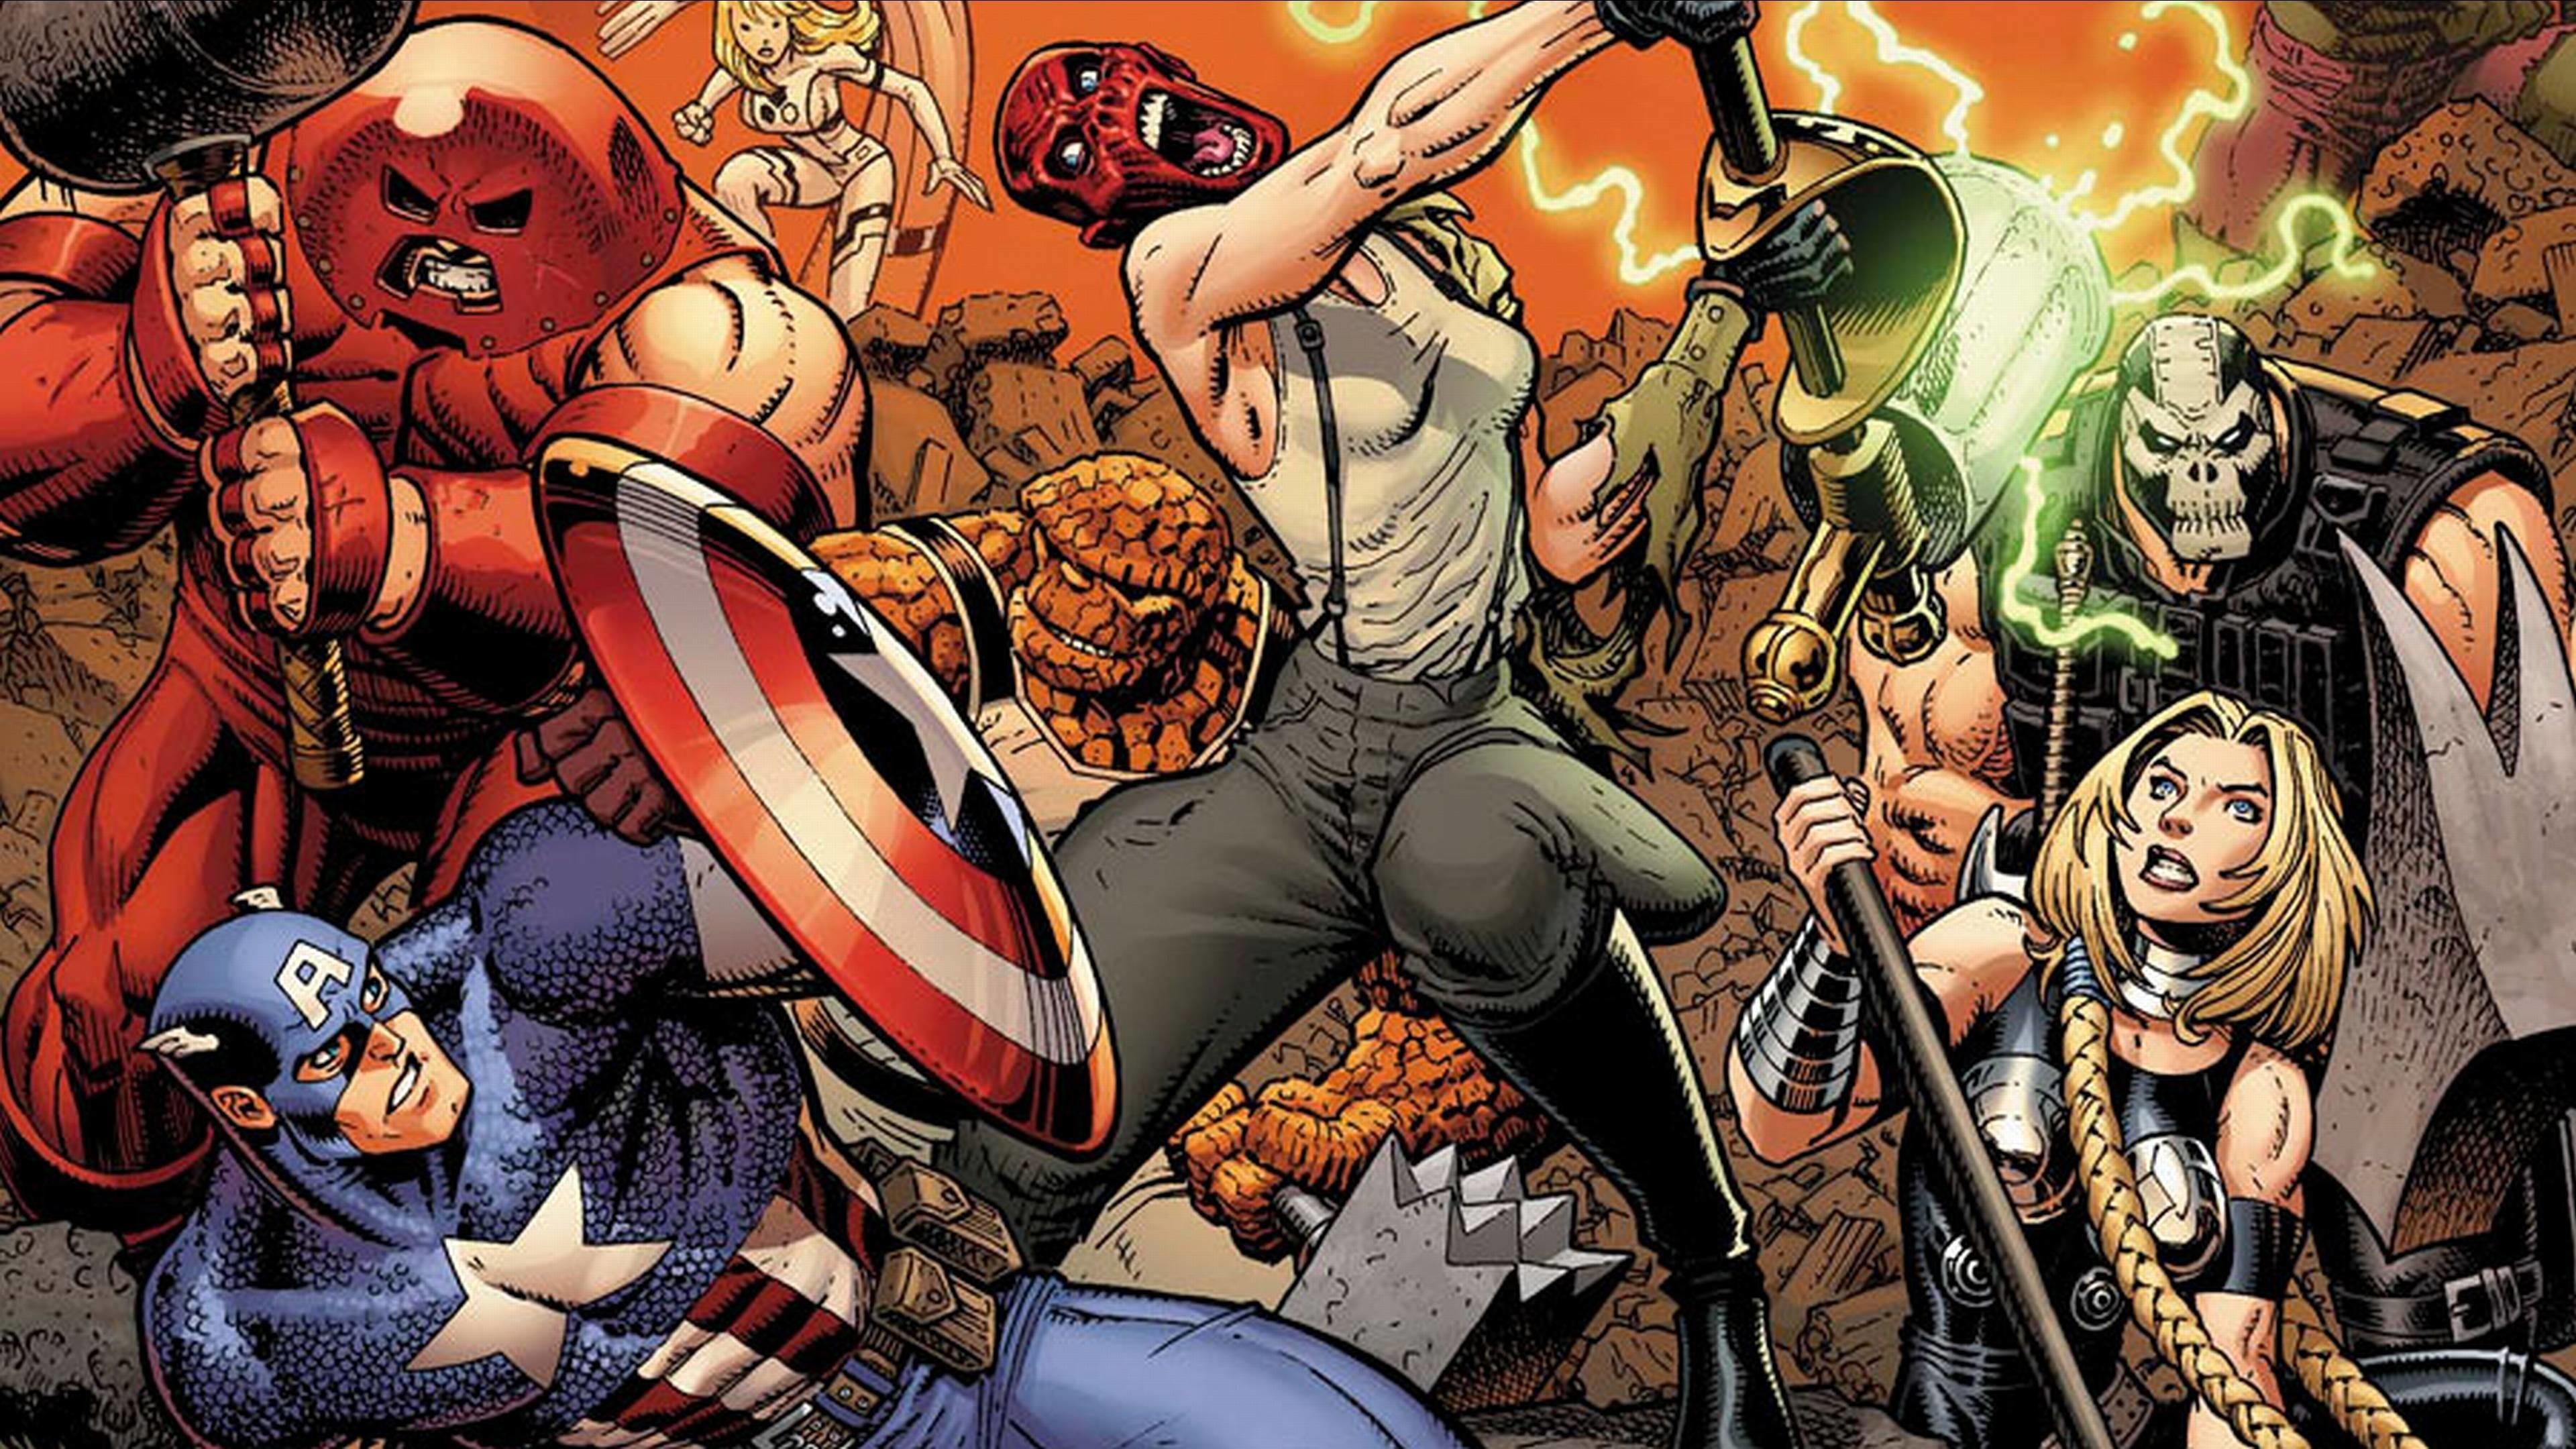 Avengers Comic Wallpaper Hd Background Wallpaper 18 HD Wallpapers .